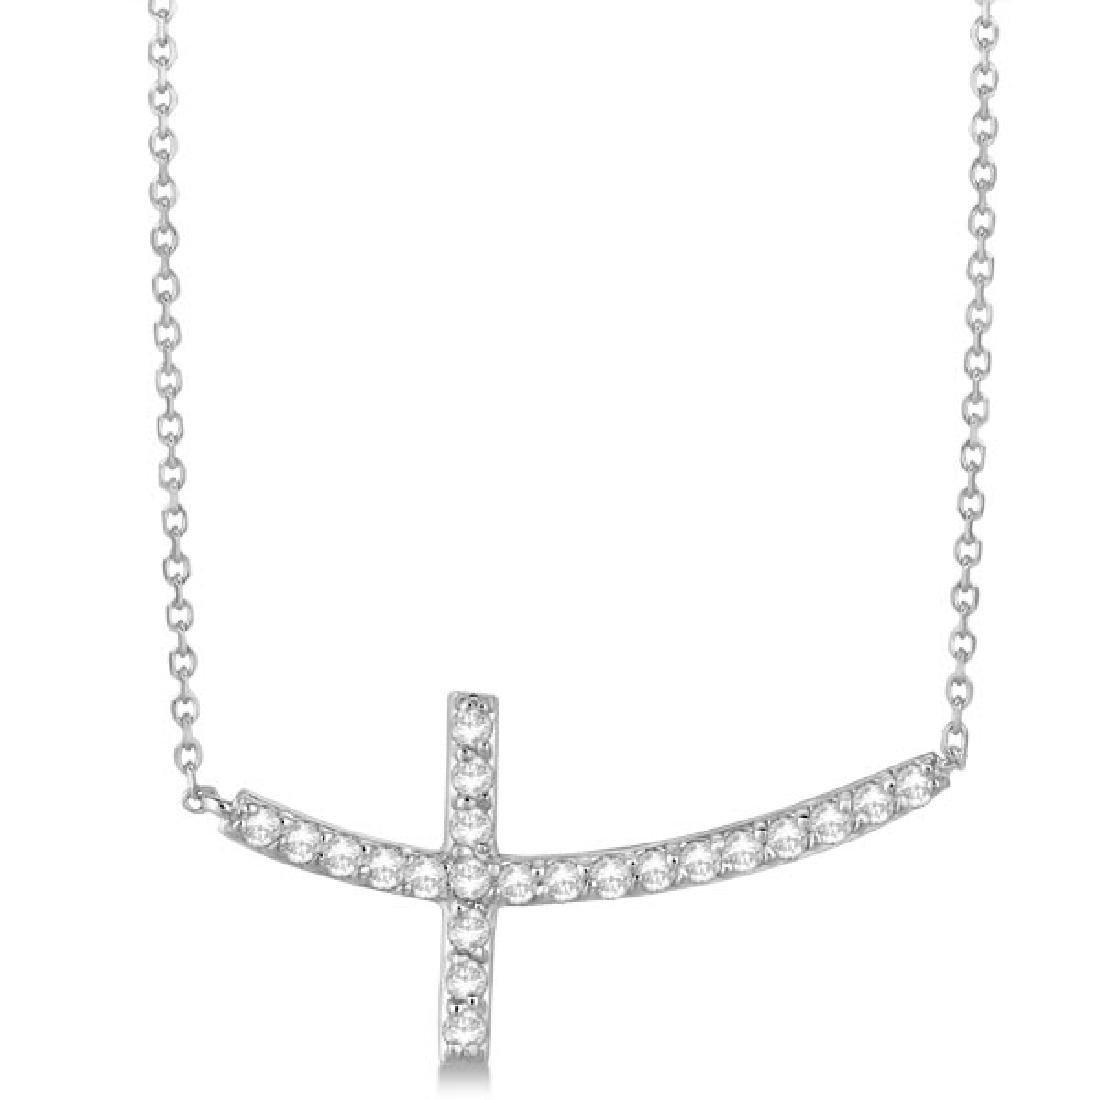 Diamond Sideways Curved Cross Pendant Necklace 14k Whit